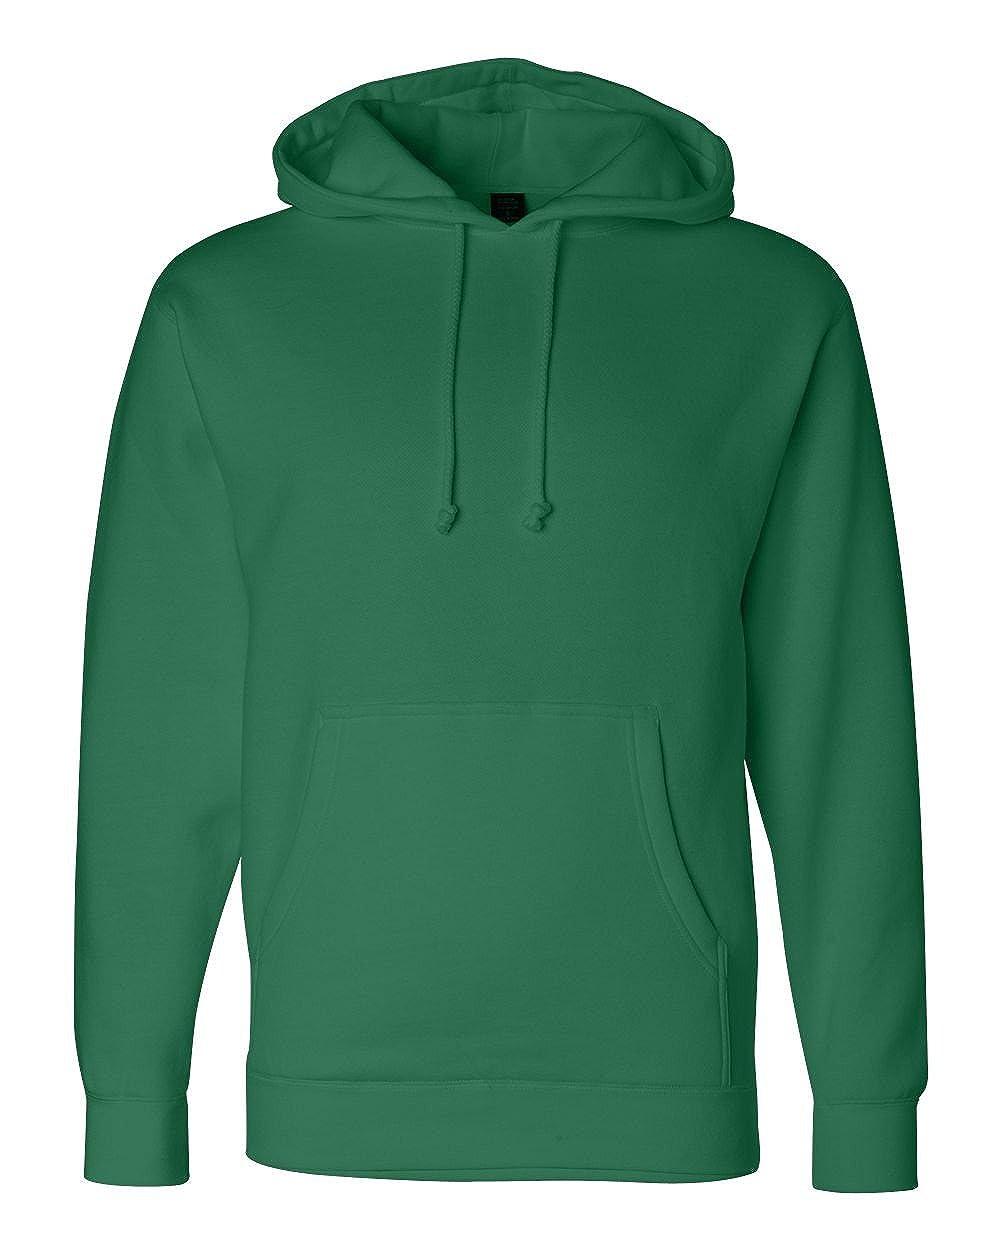 ITC Mens Hooded Pullover Sweatshirt IND4000